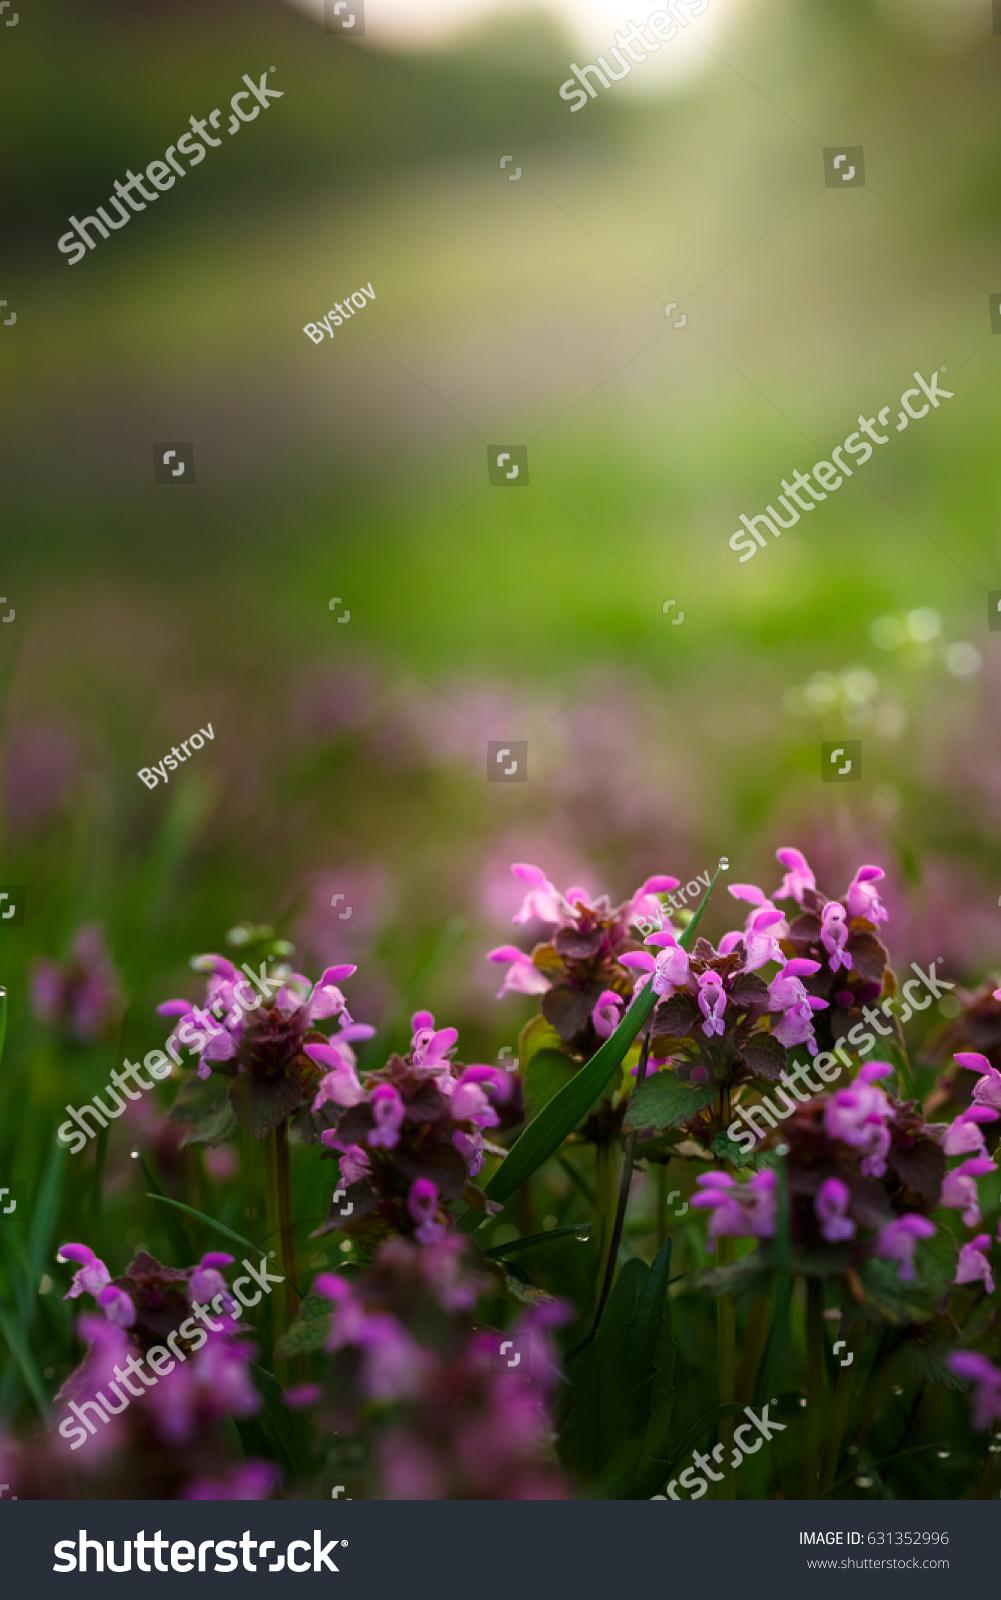 Purple Flowers Grass Stock Photo Edit Now 631352996 Shutterstock